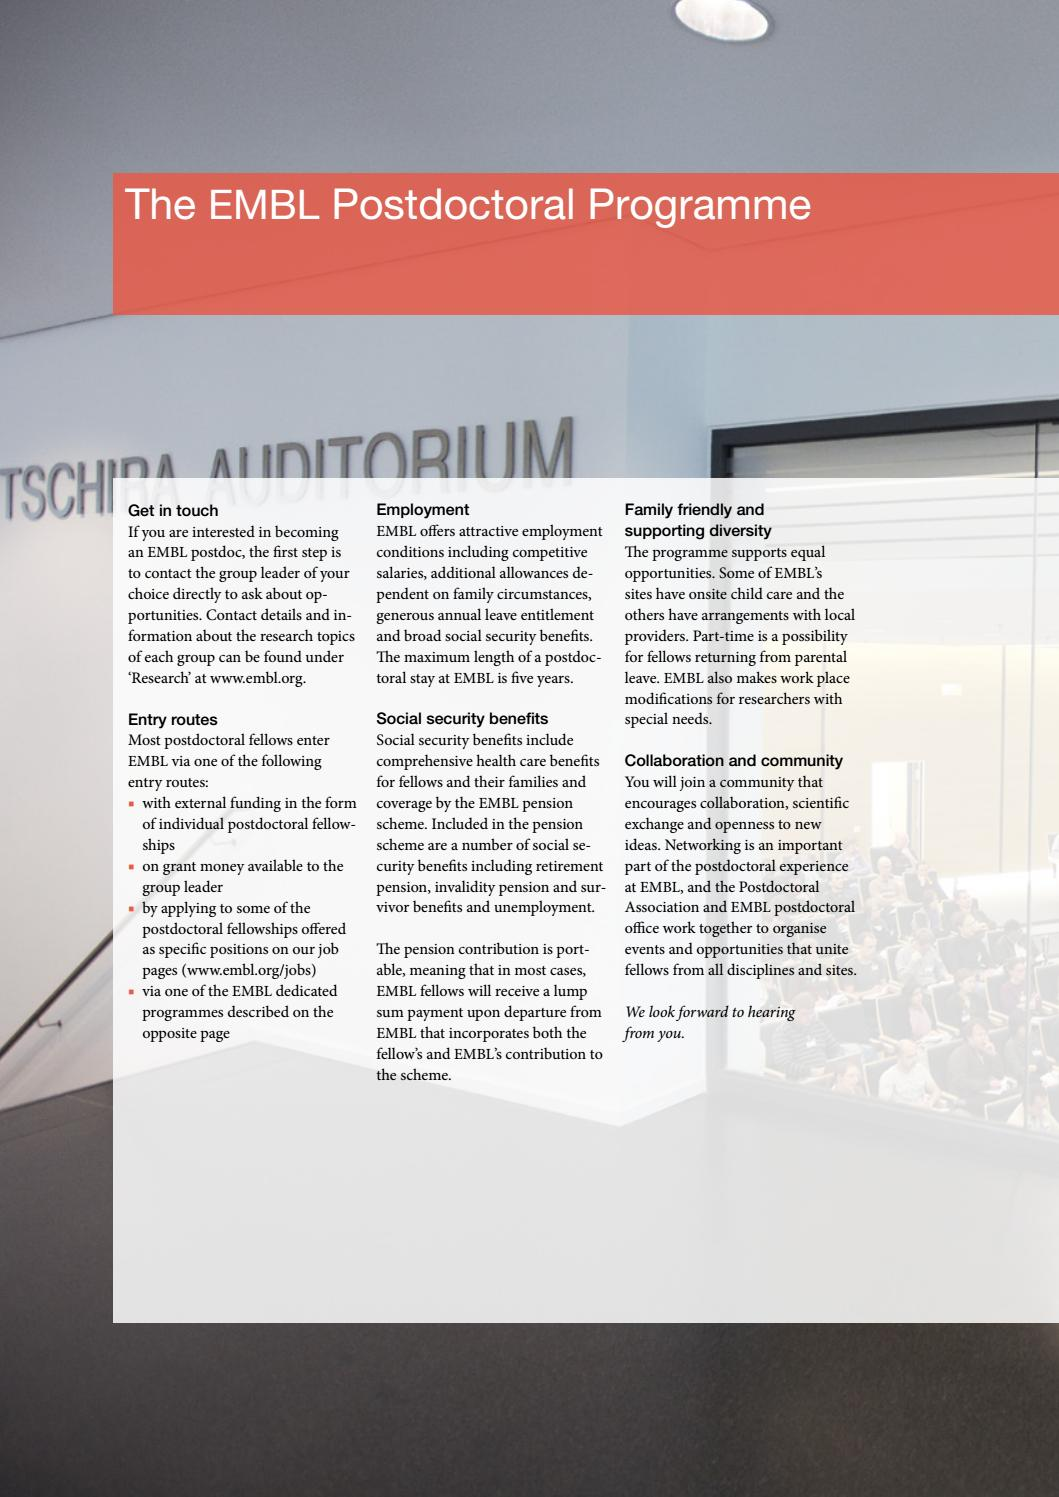 EMBL Postdoctoral Programme by European Molecular Biology